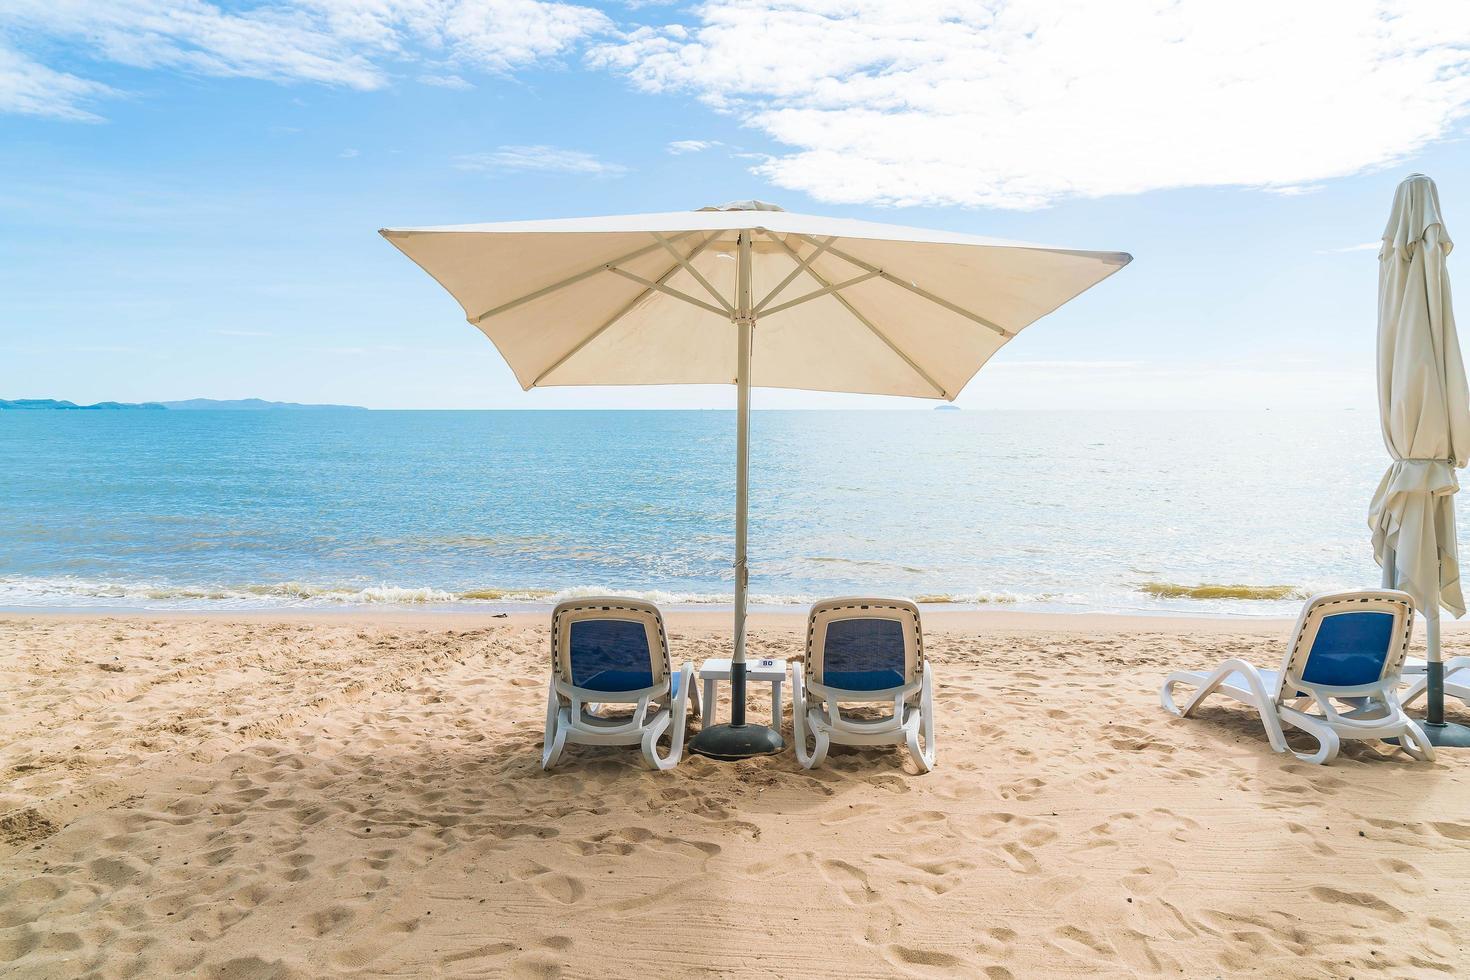 solparaply på stranden foto